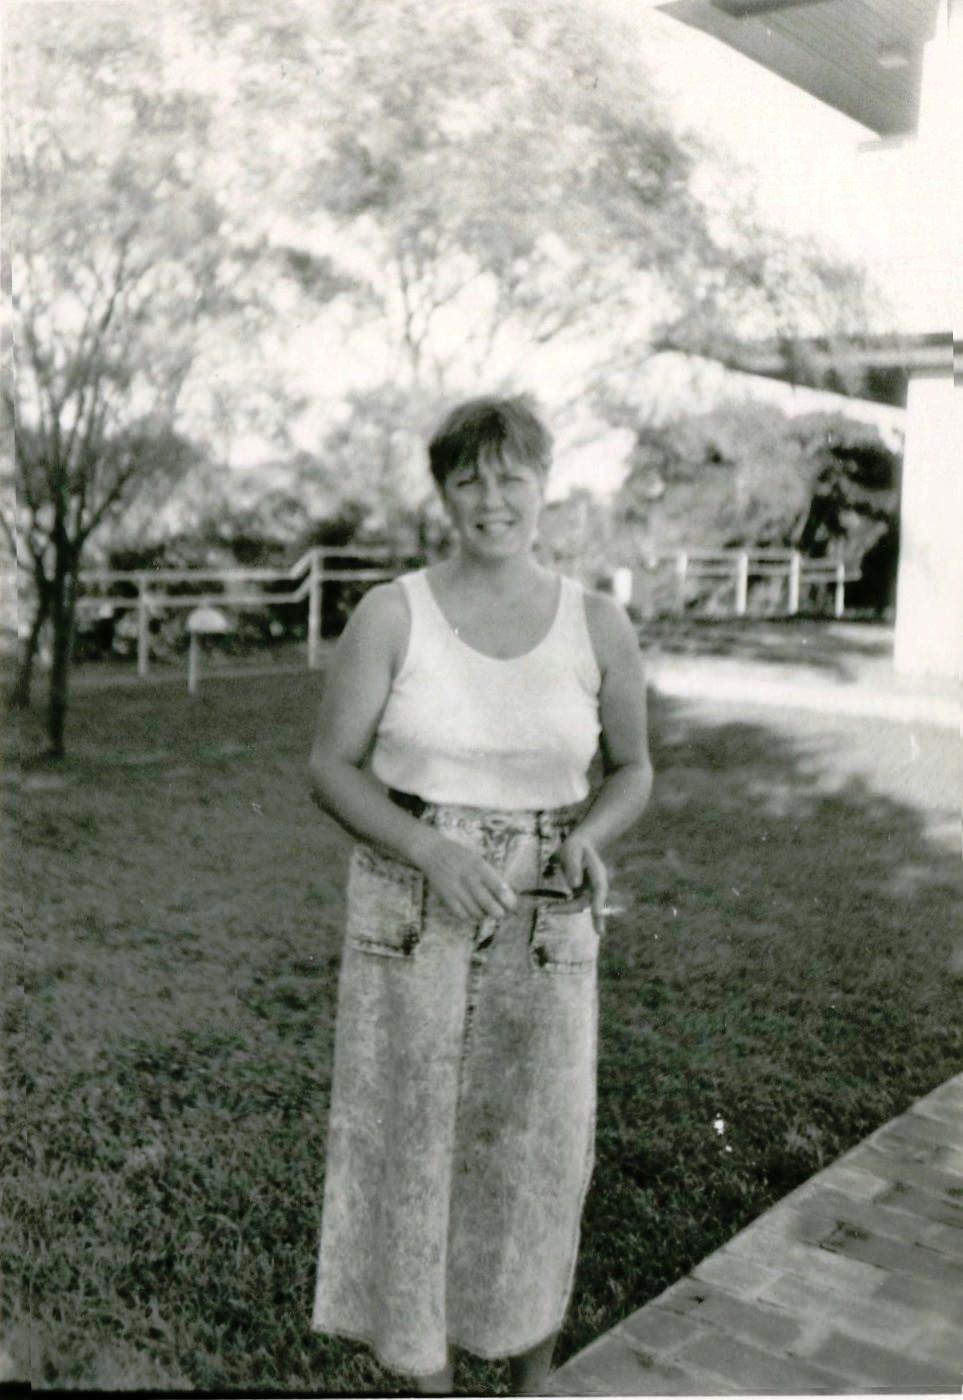 1989. Баракоа. В гостинице, фото 5